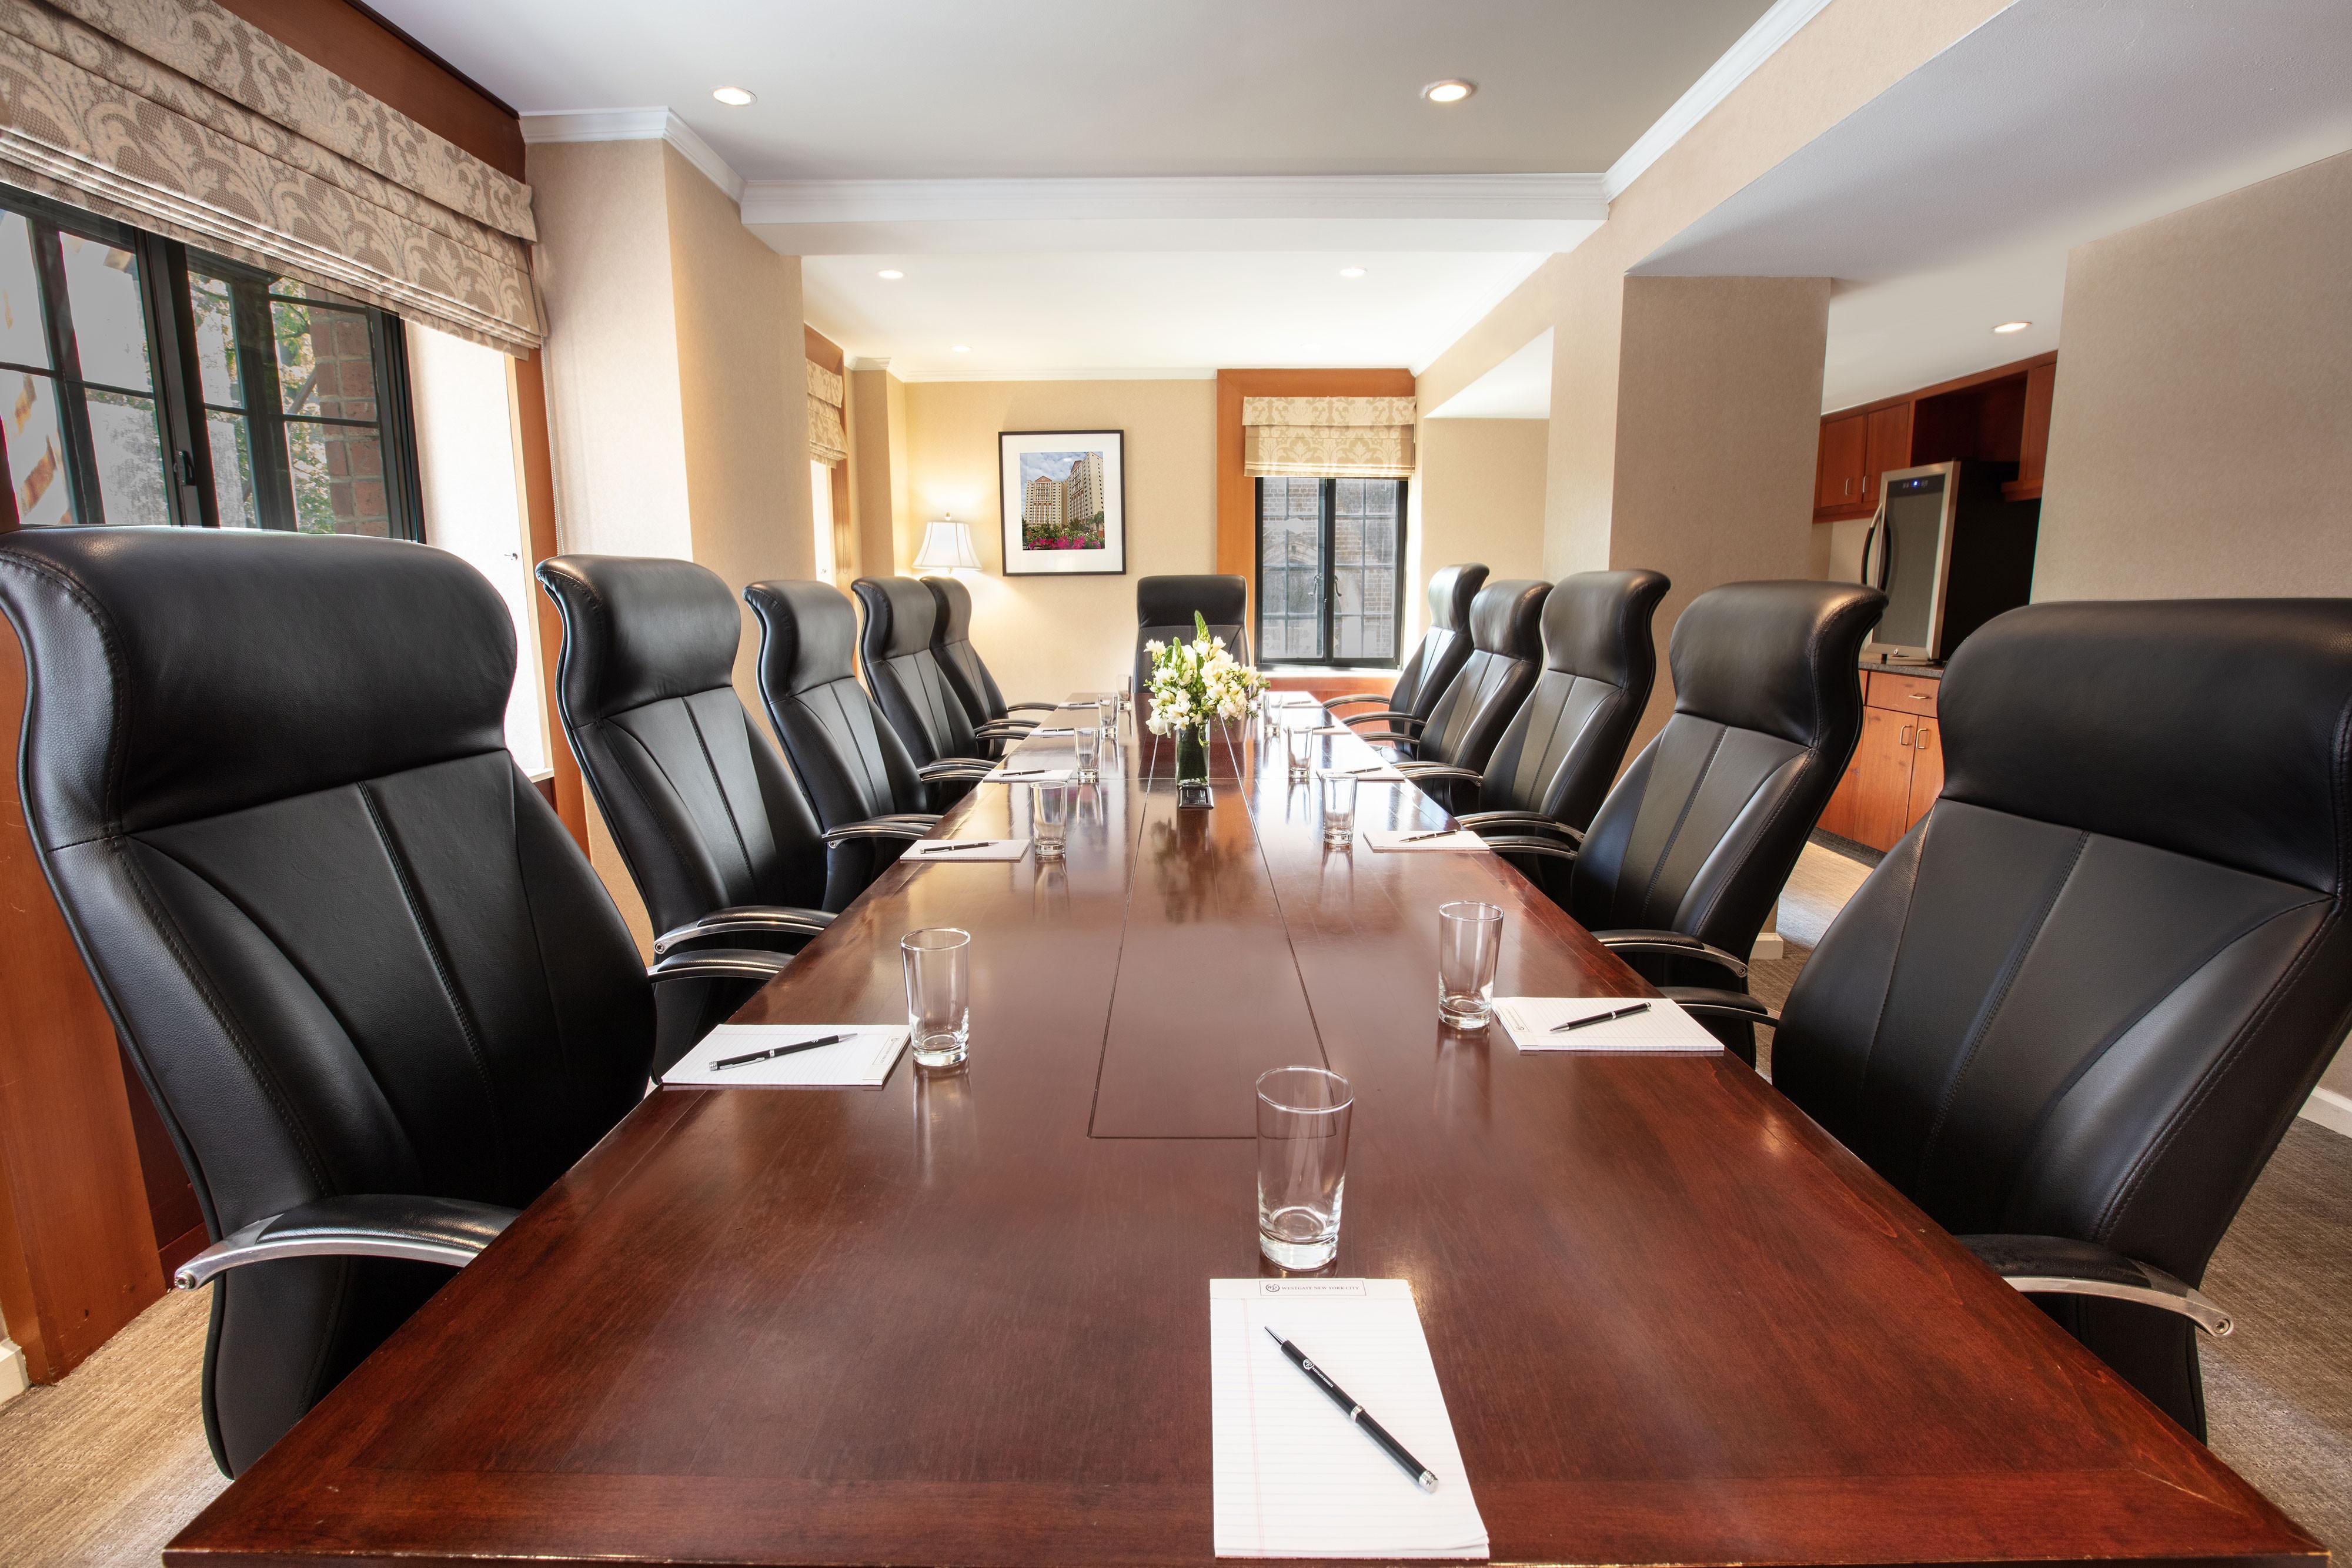 Westgate - Timeshare Resale Companies Under Investigation